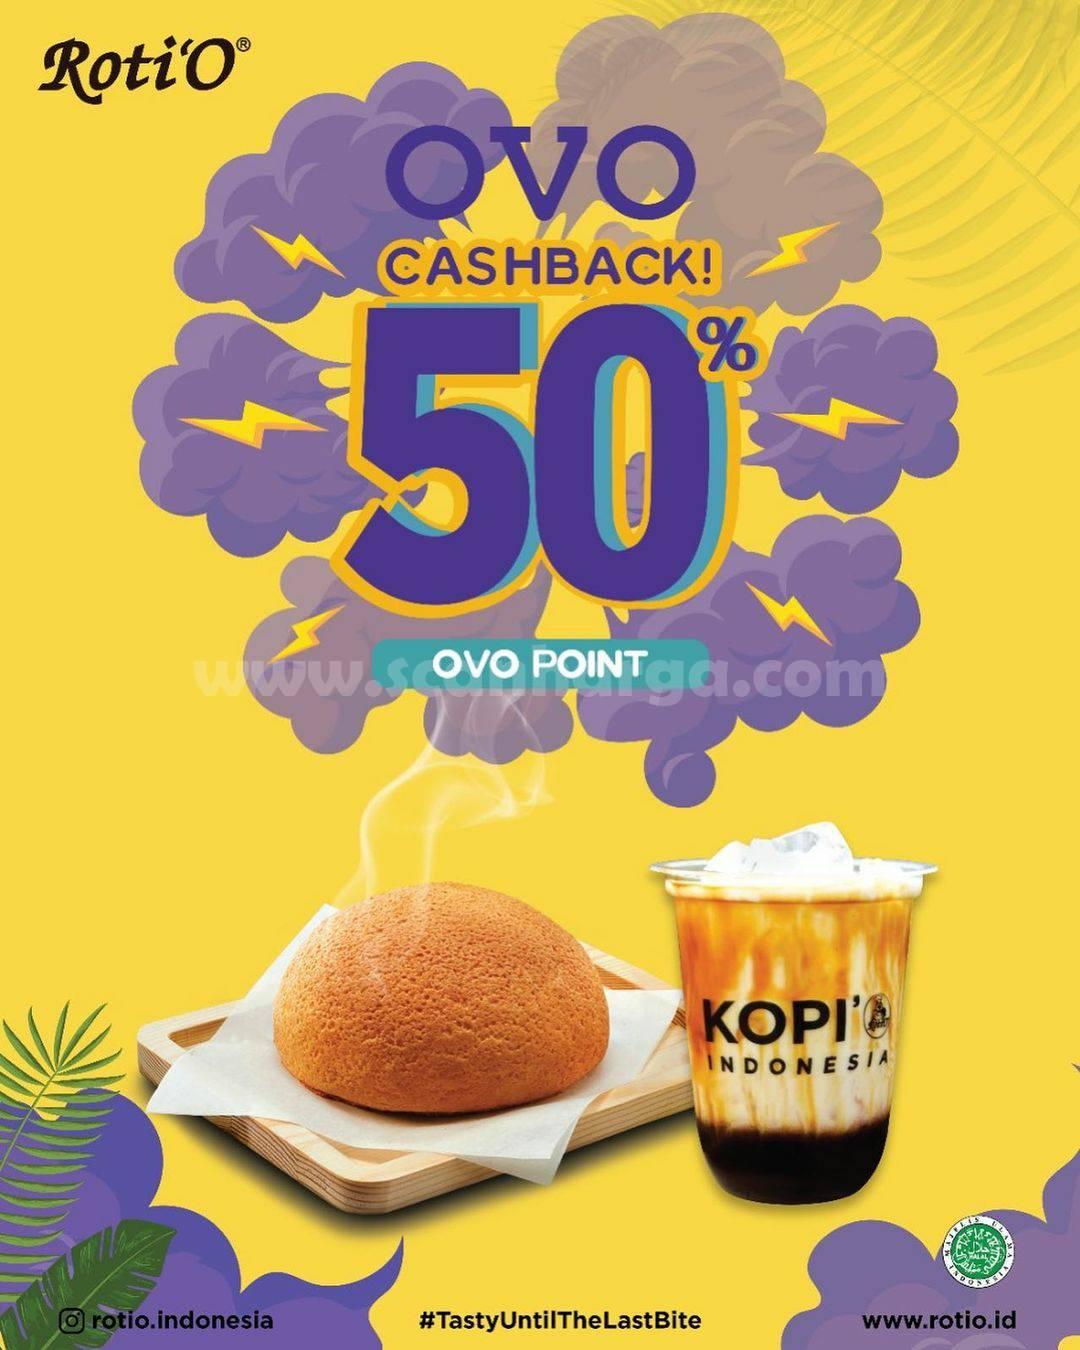 Promo Roti 'O Cashback Attack 50% pakai OVO